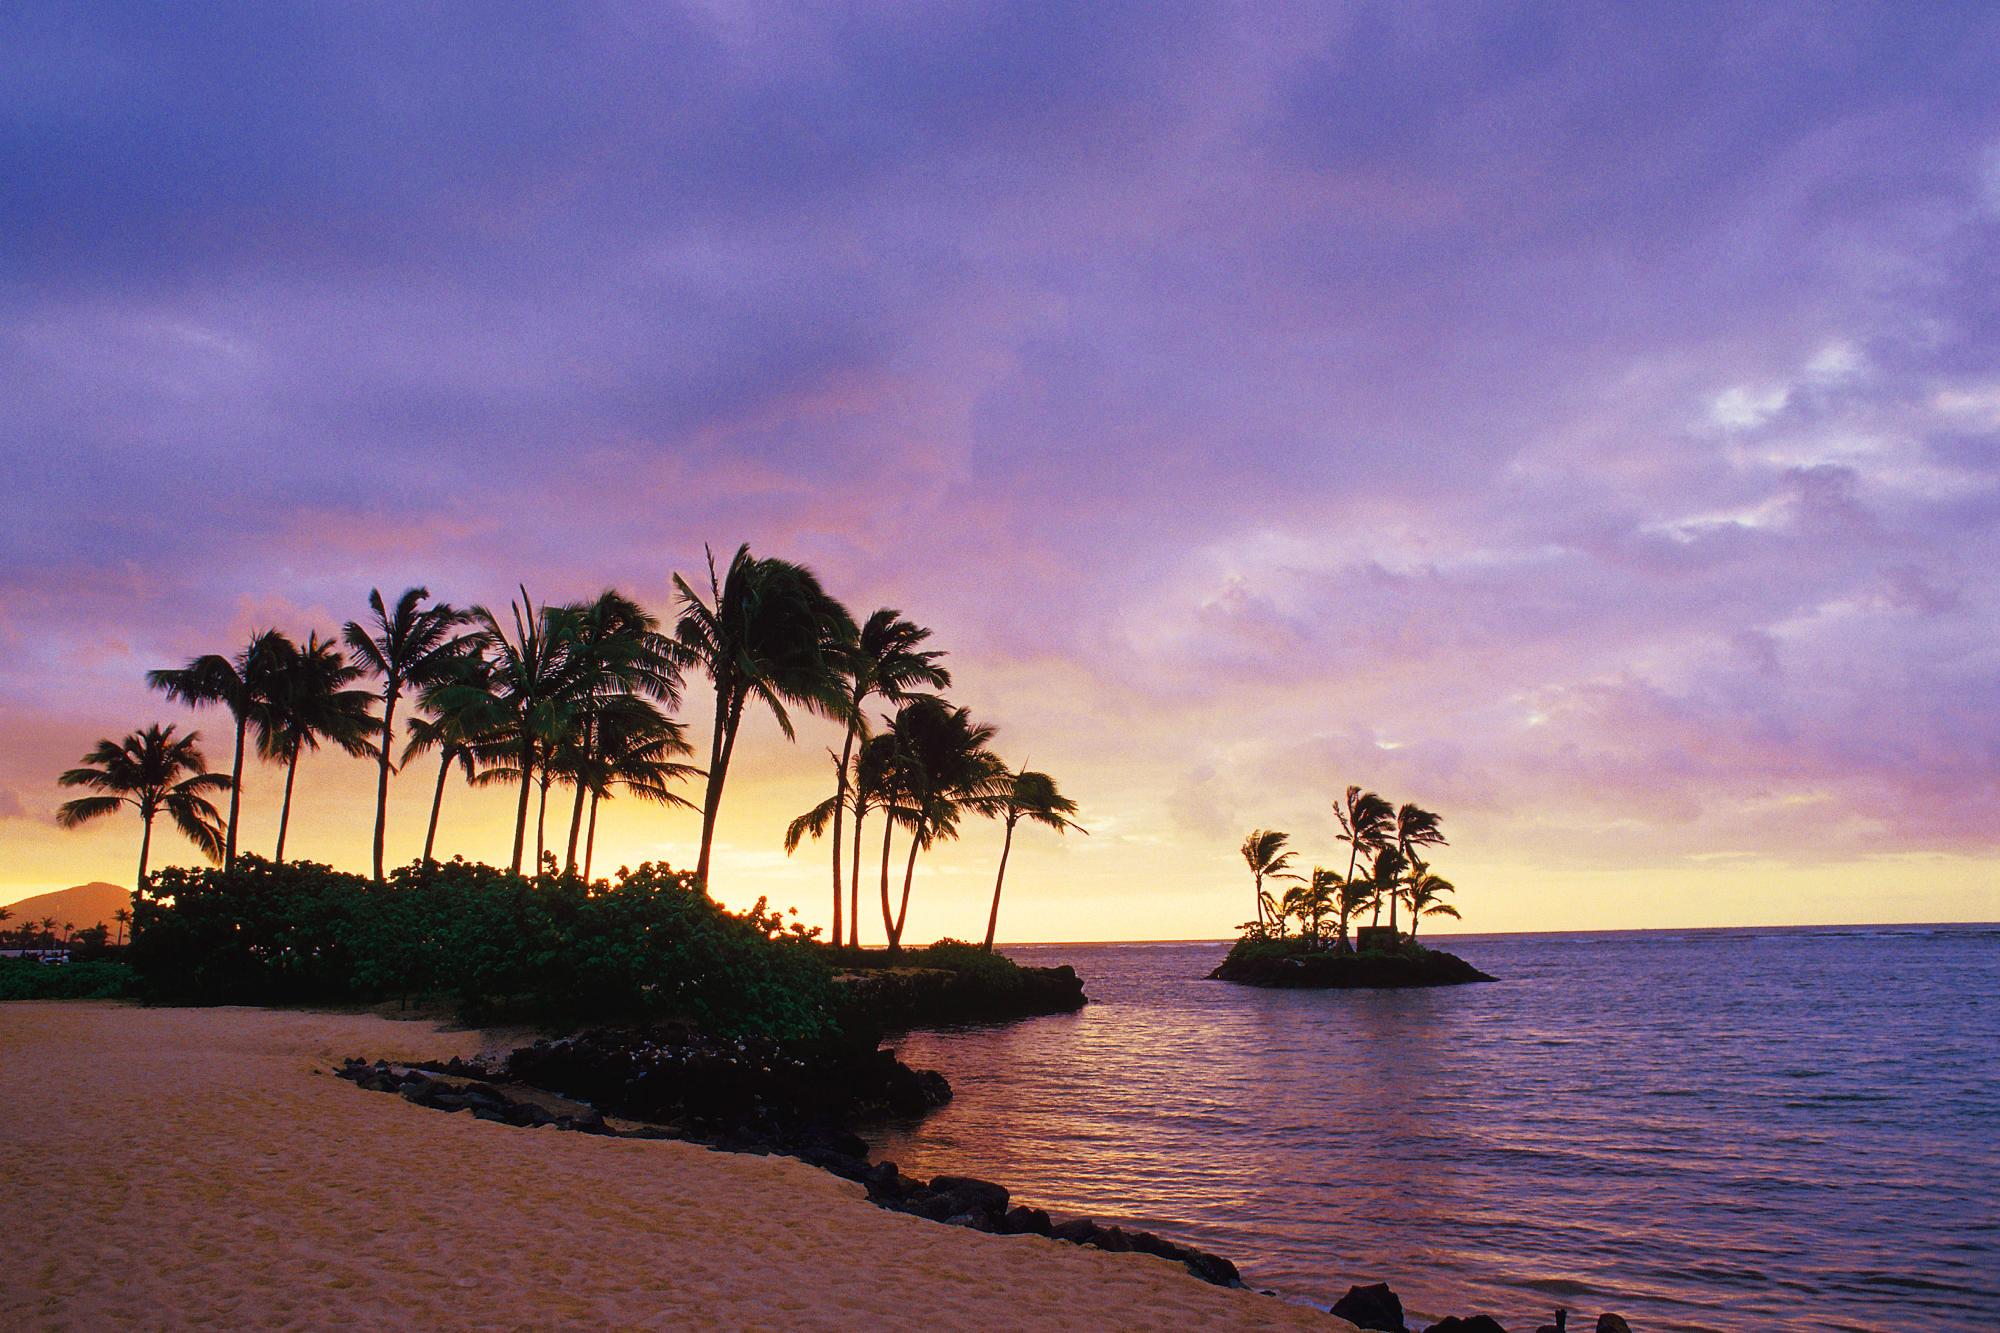 The inspiring wallpaper of the Wai alae Beach Honolulu Hawaii